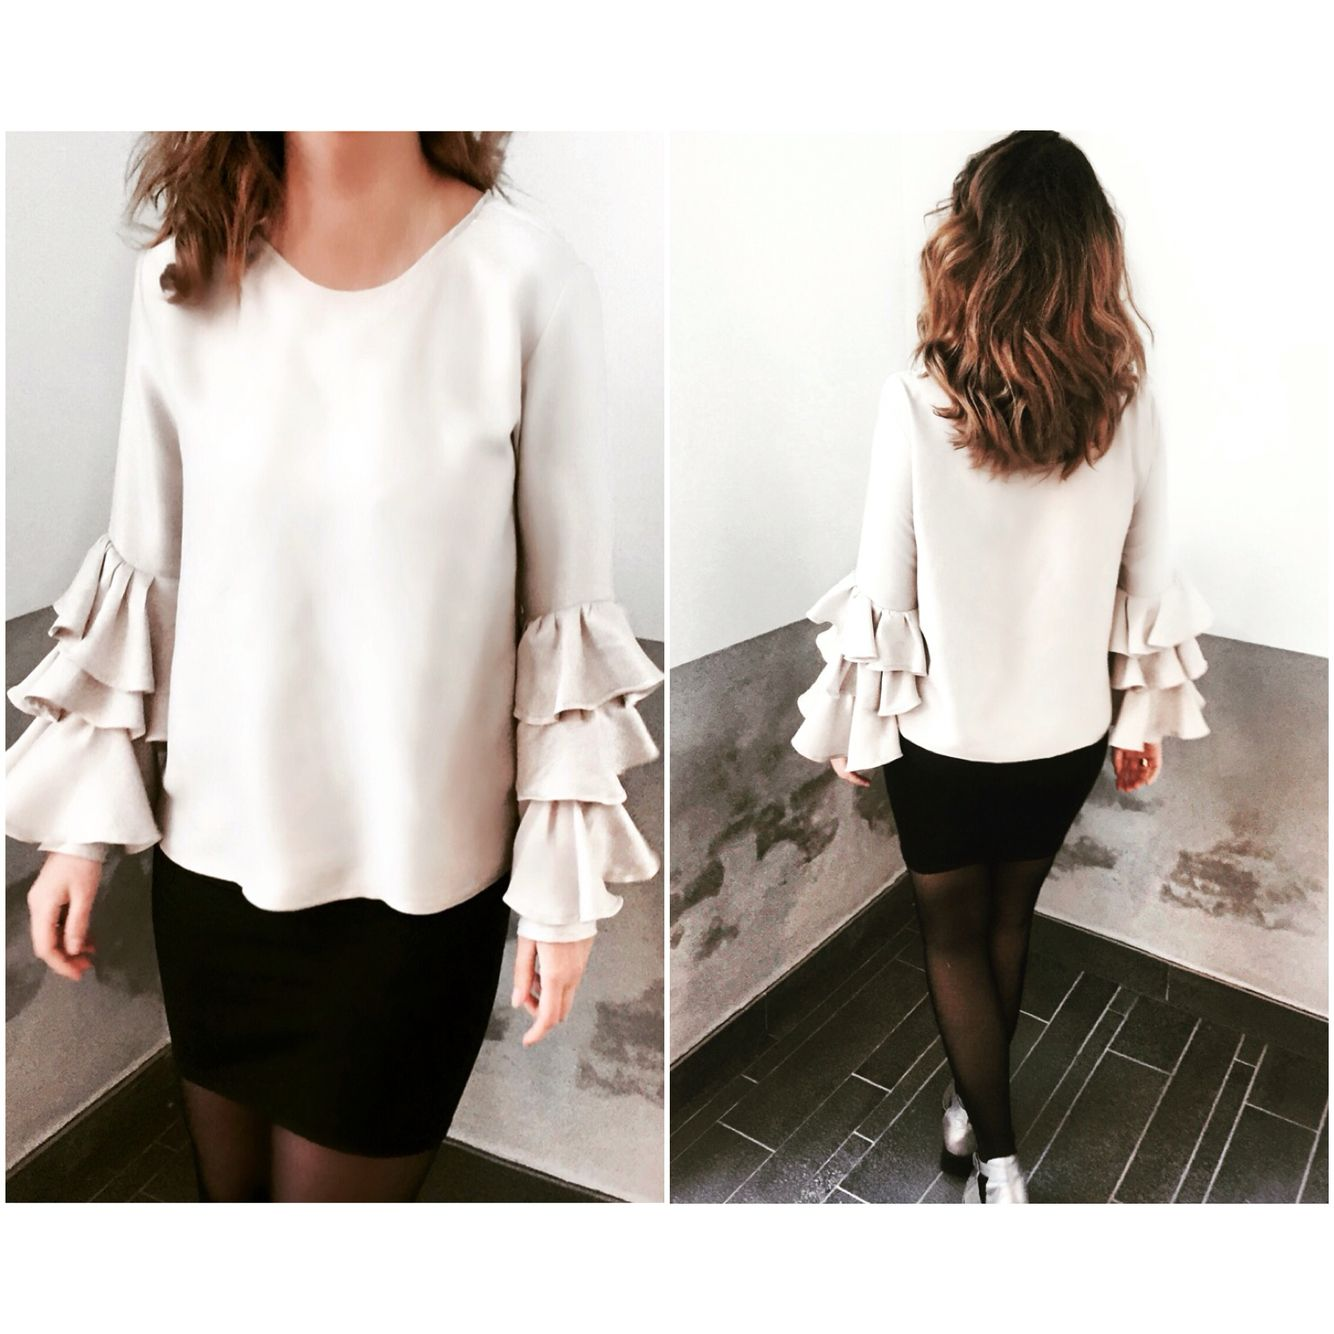 #fashion #dress #shirt #beige #sand #sofiekimman